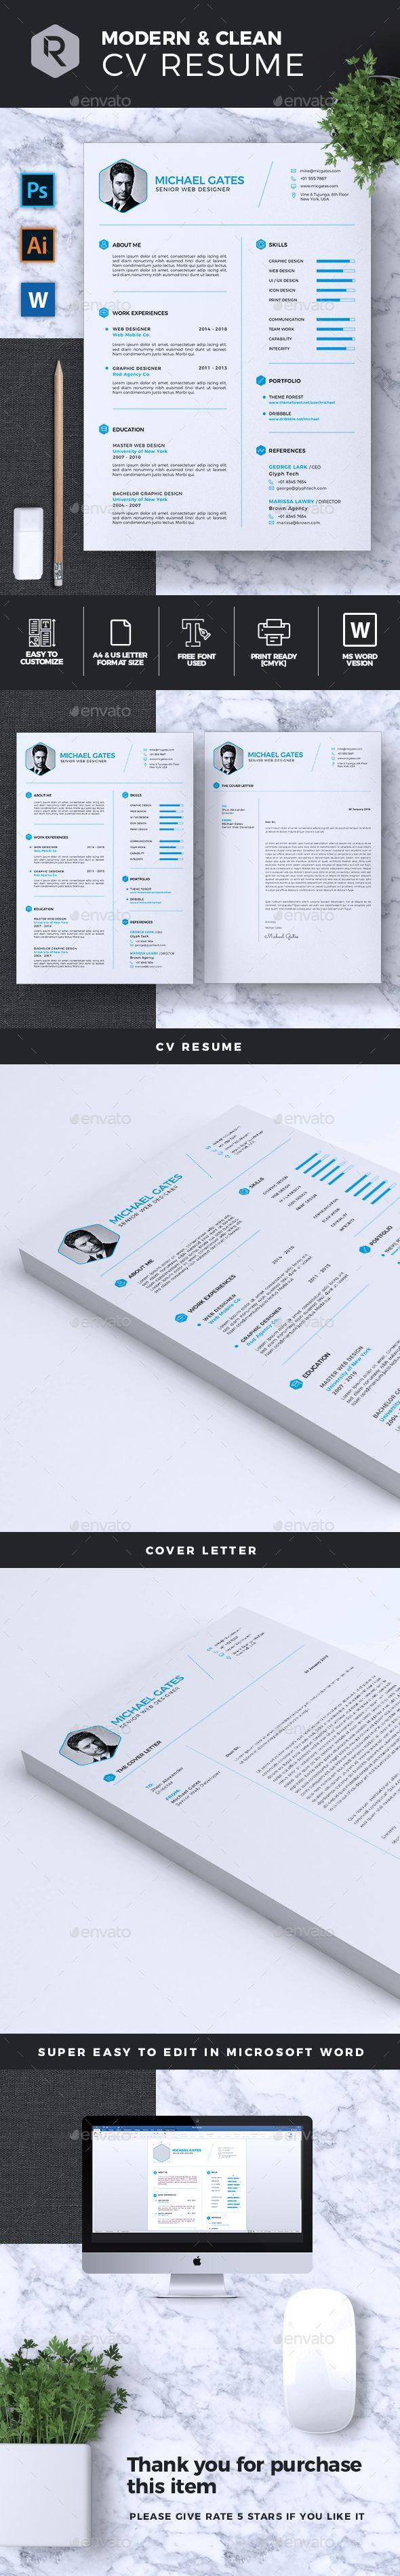 police resume template%0A CV Resume